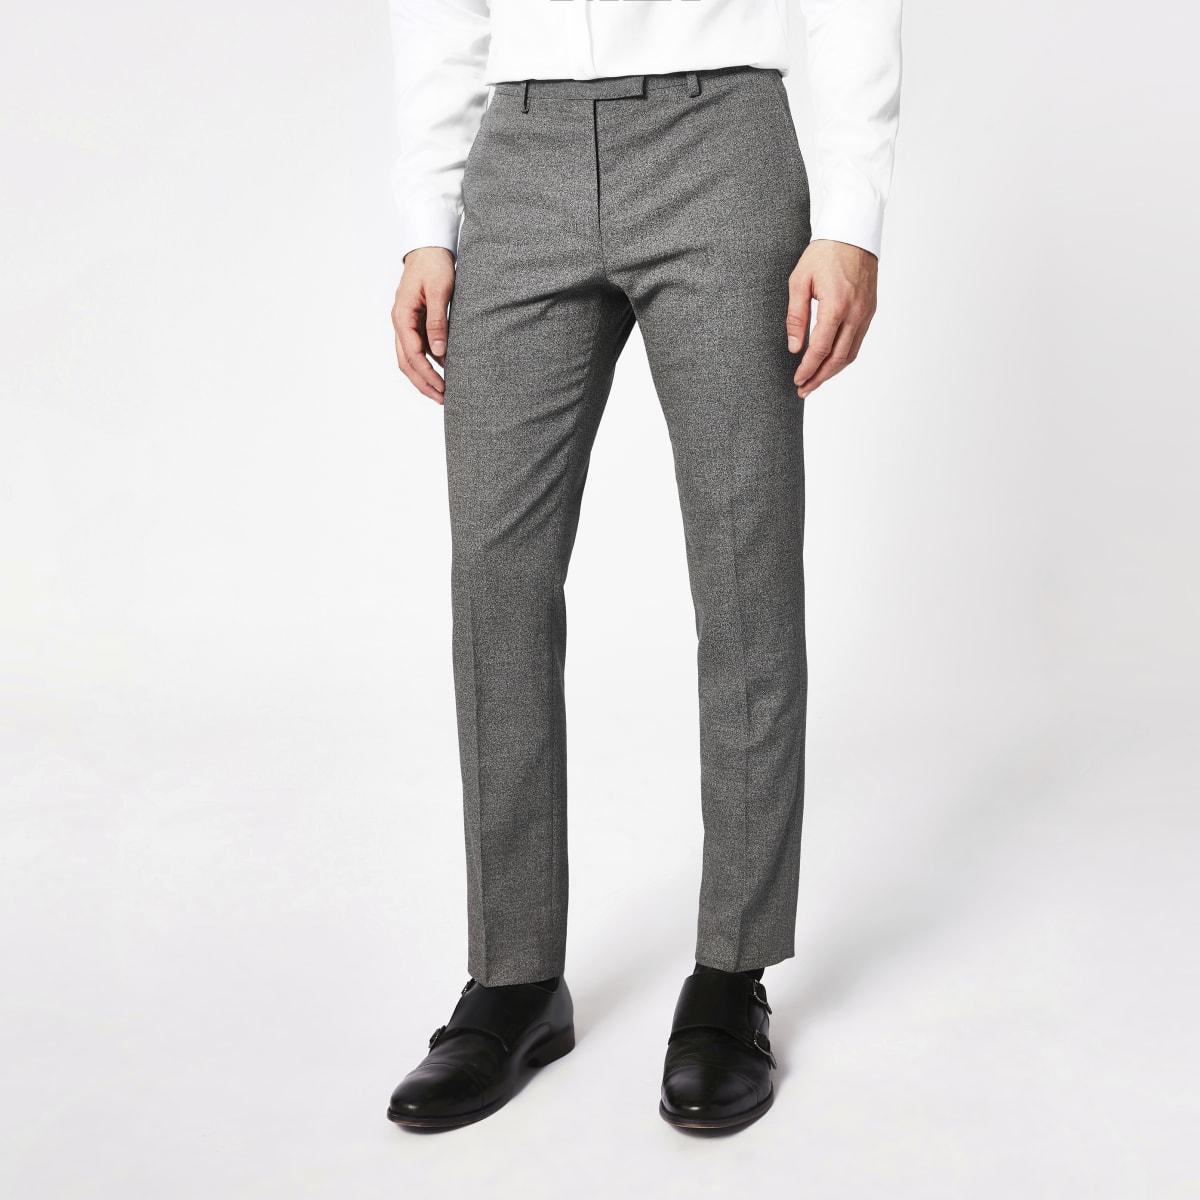 Pantalon de costume skinny gris foncé